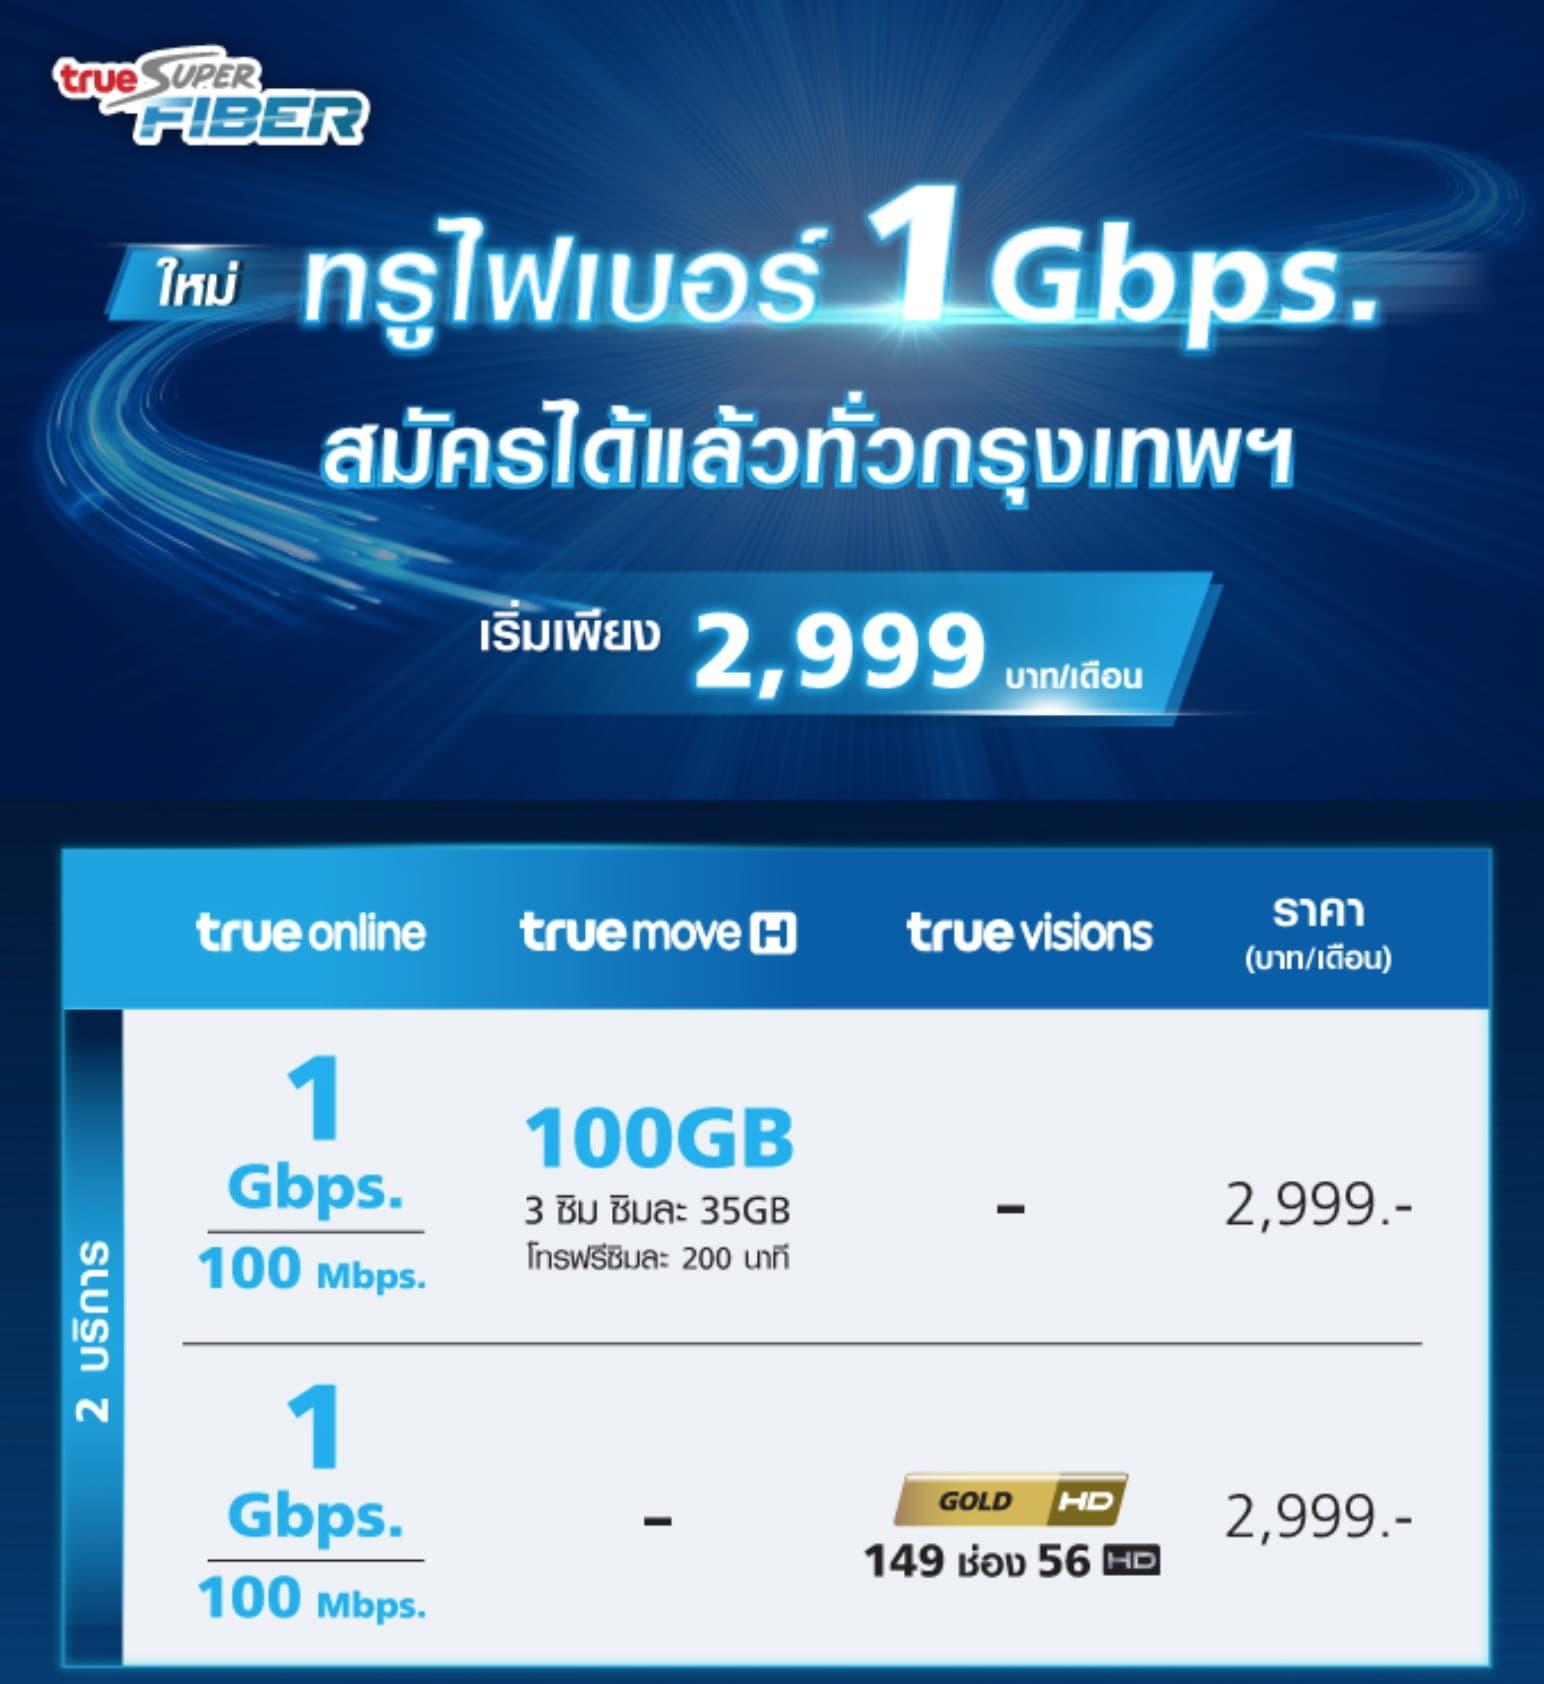 True Online Fiber 1gbps 2999thb